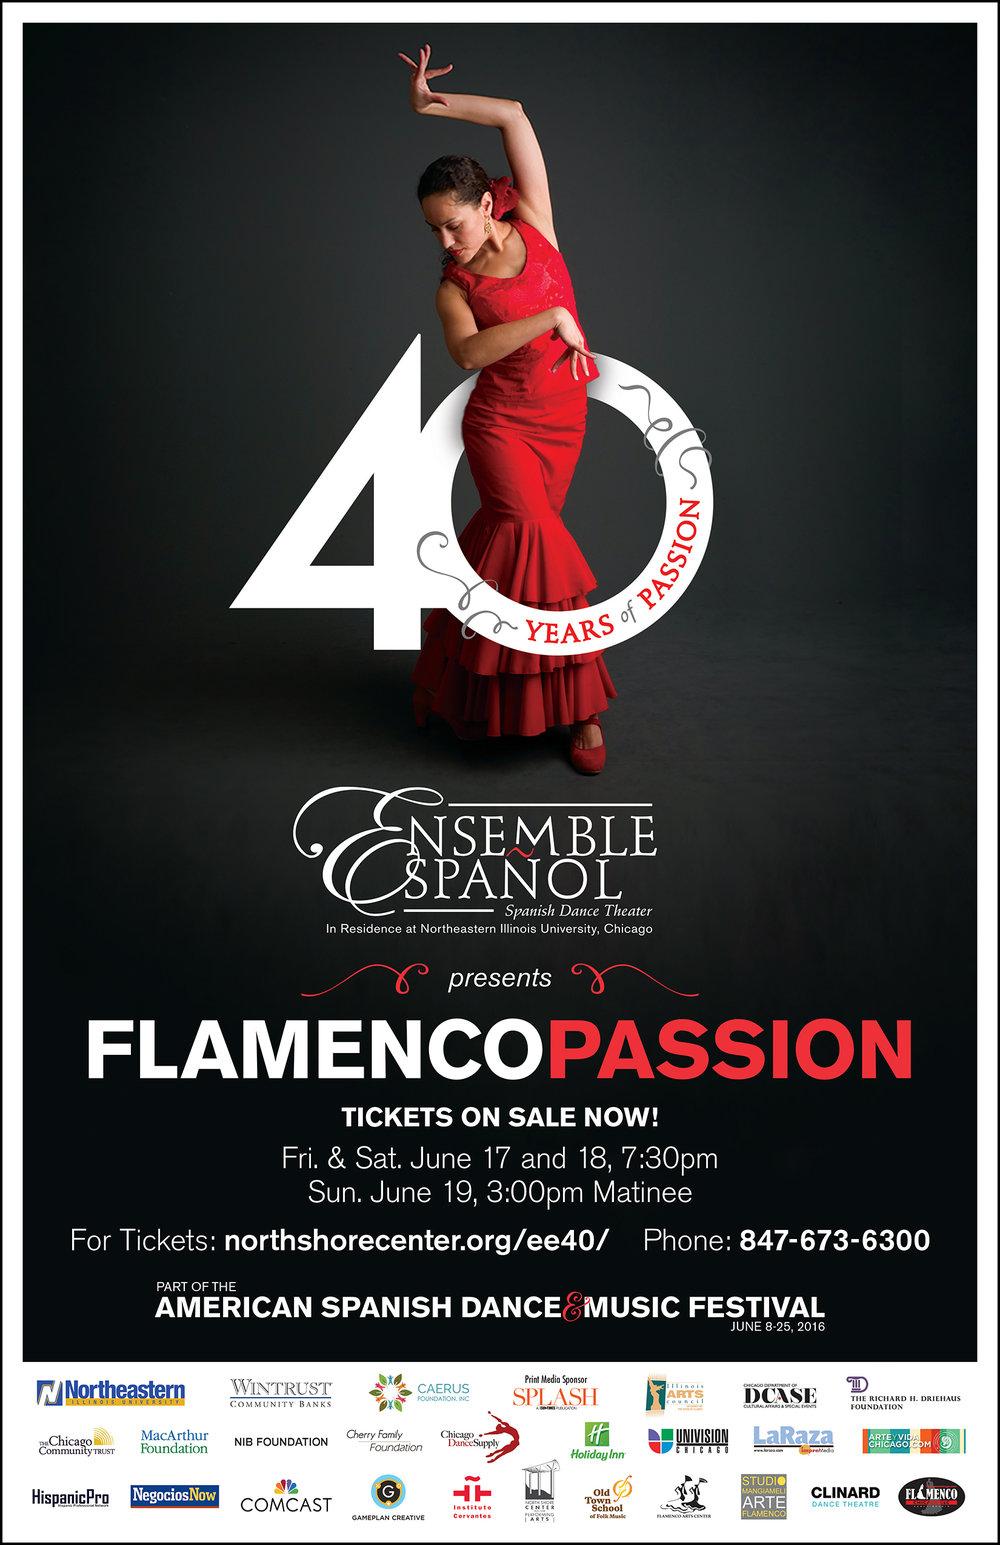 Flamenco Passion Poster